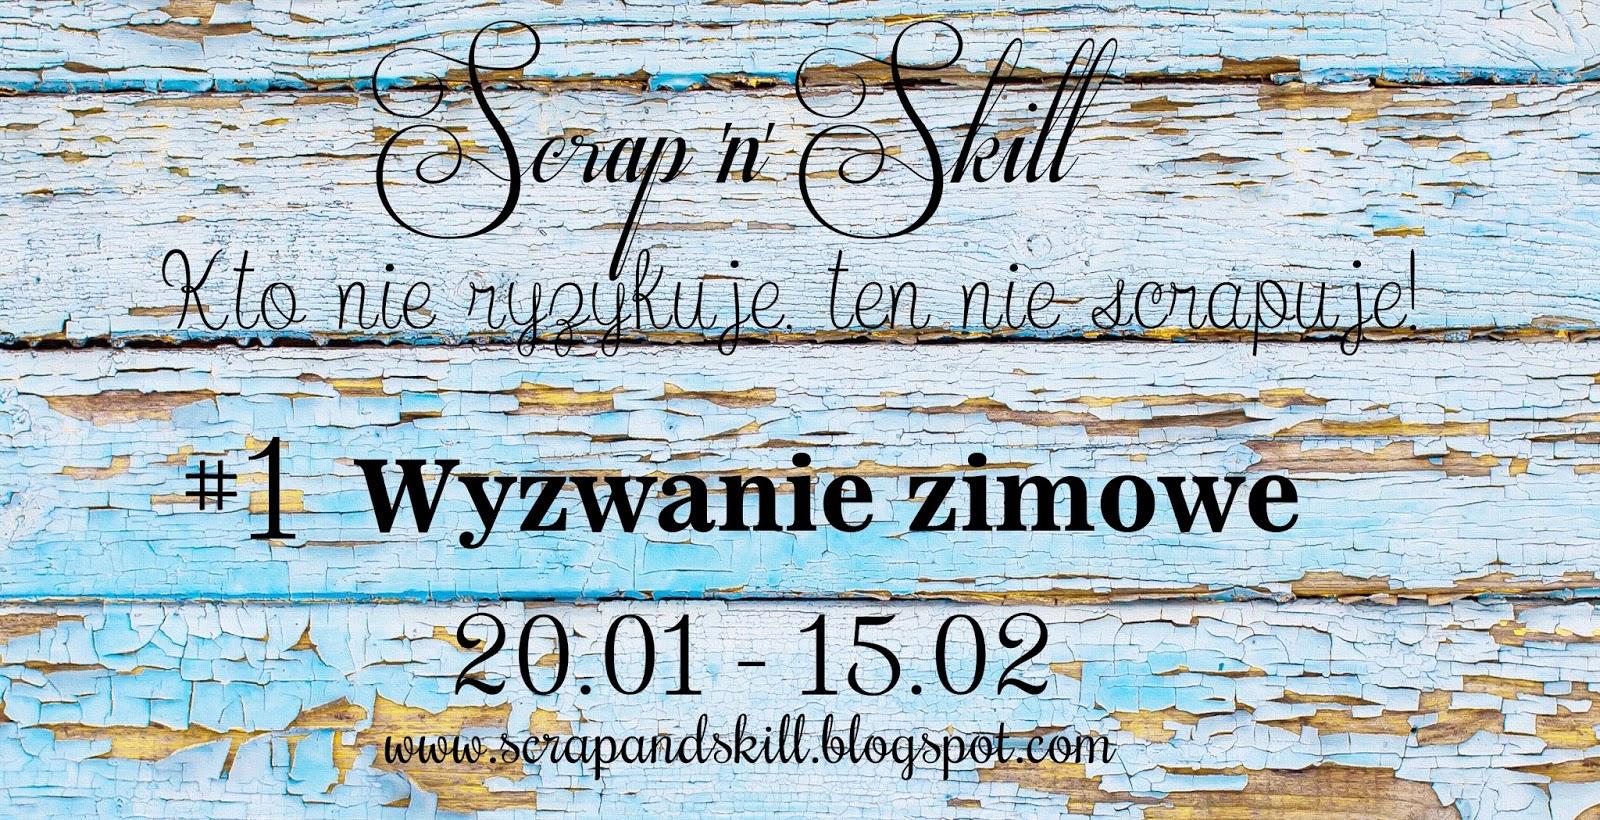 Scrap'N Skill